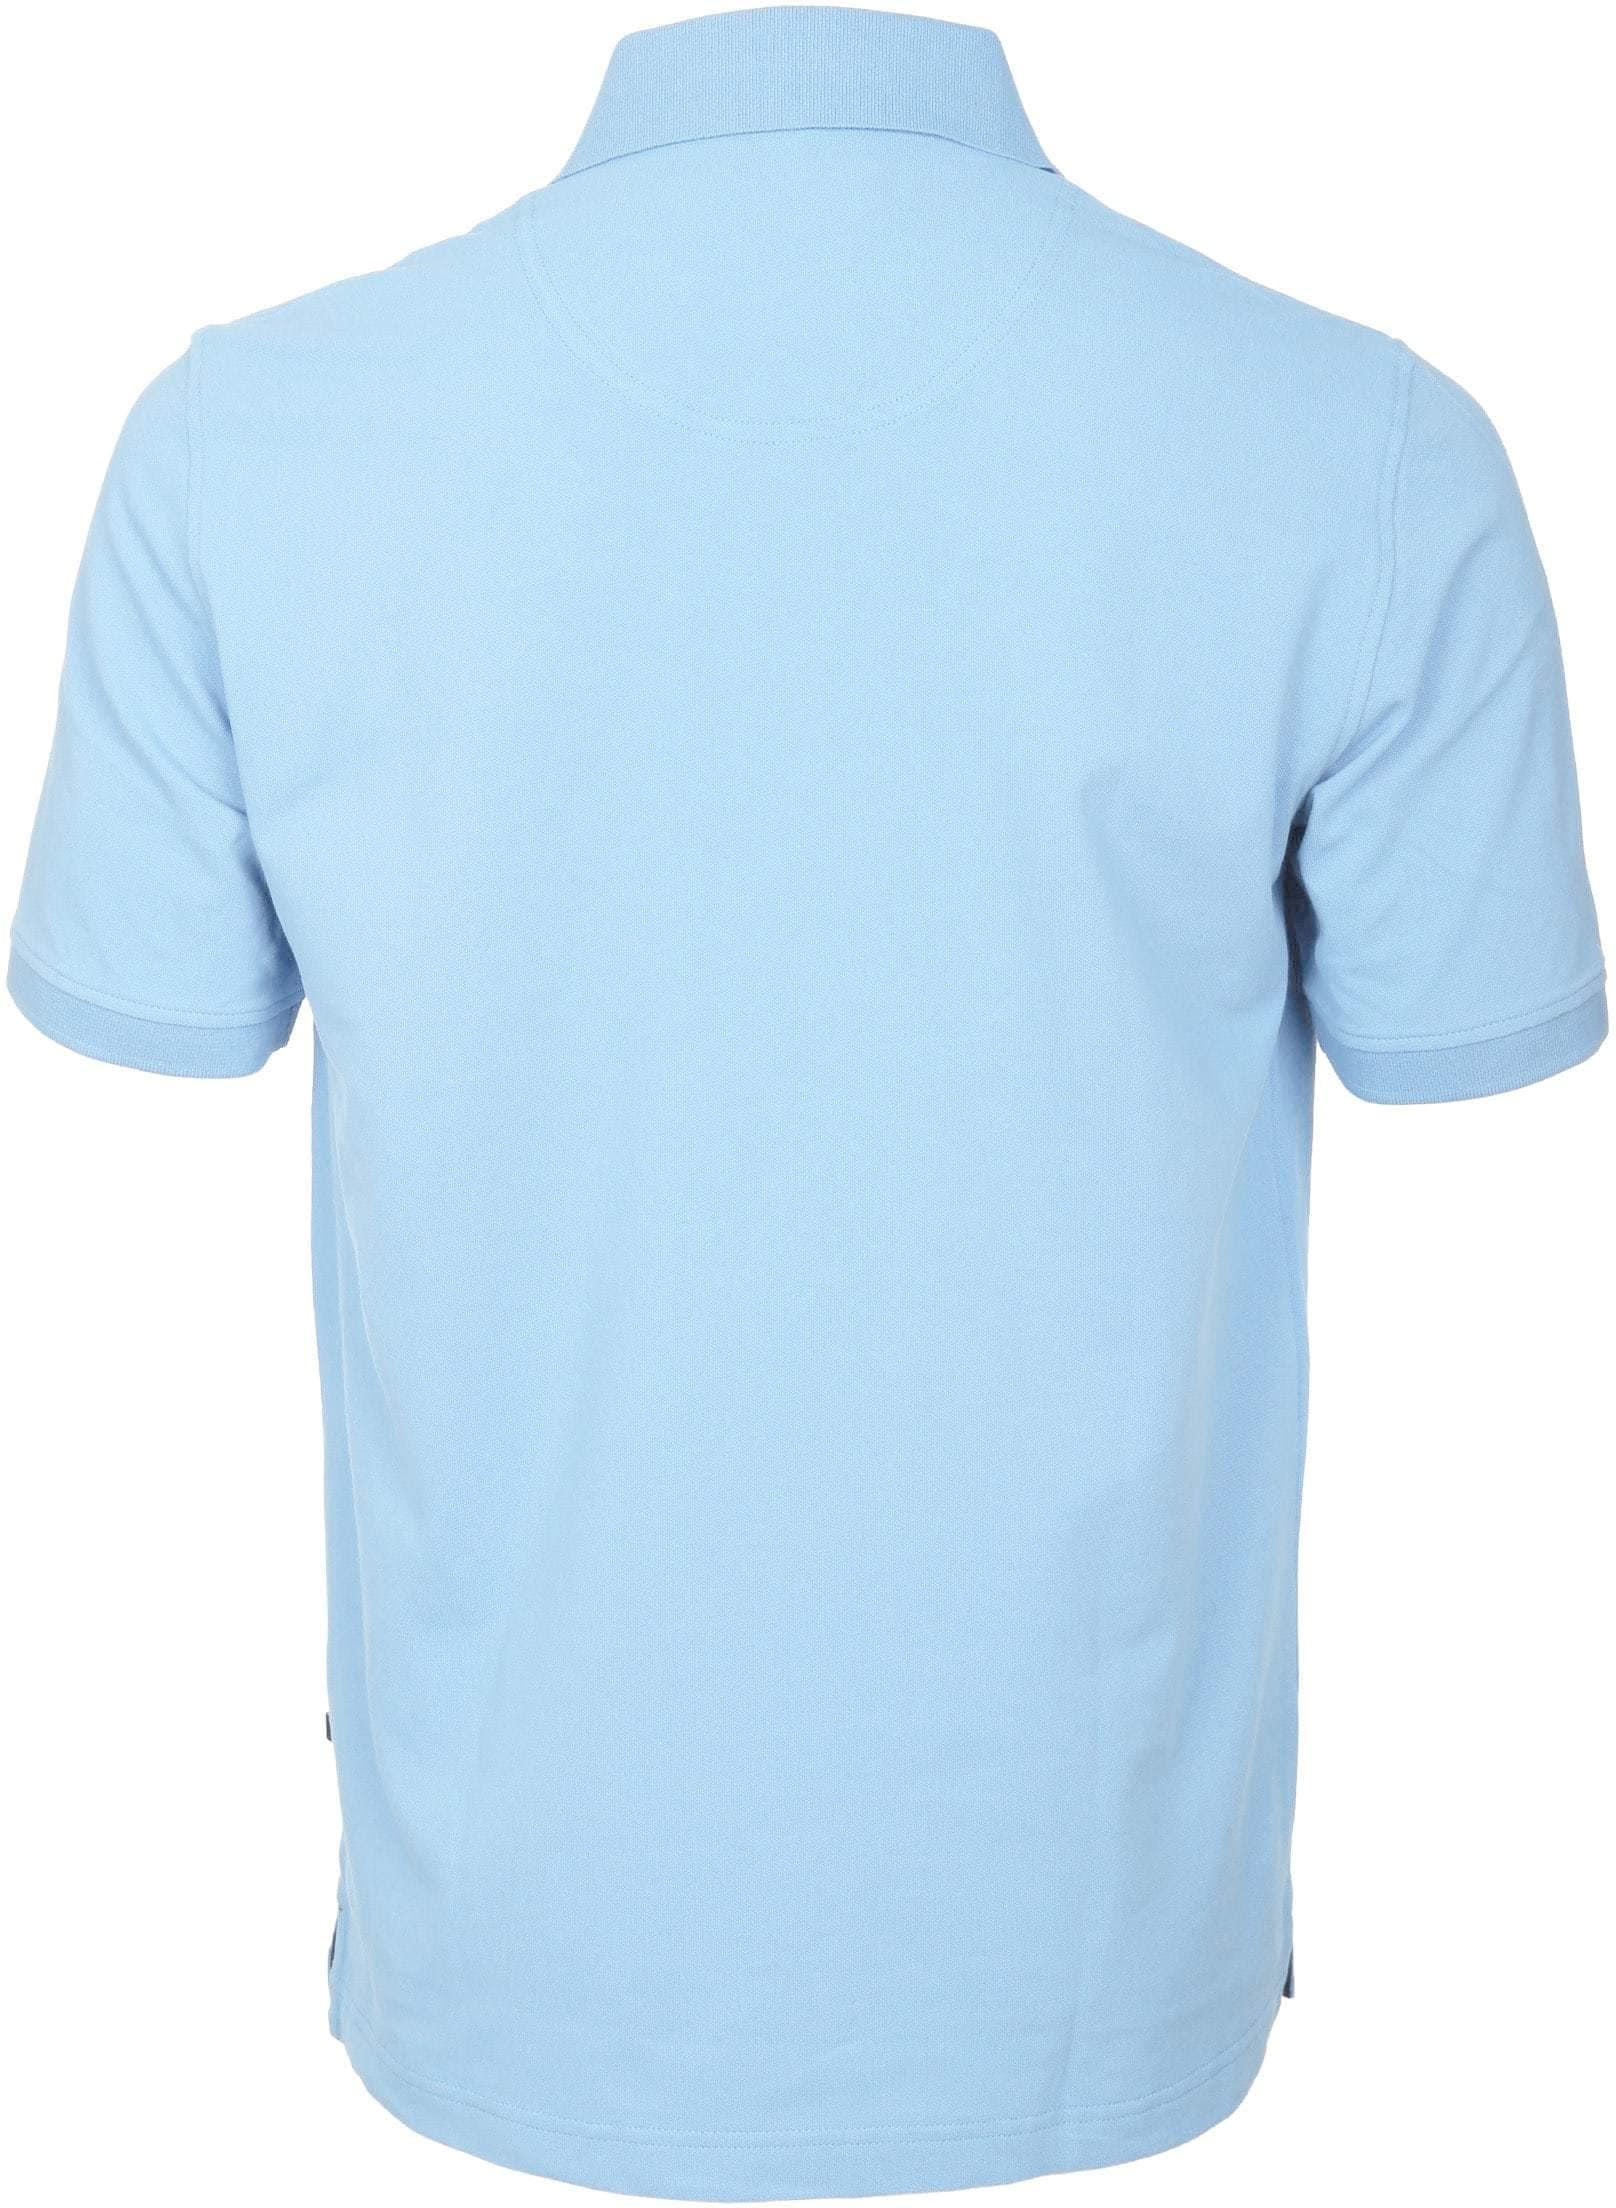 Suitable Polo Basic Lichtblauw foto 4